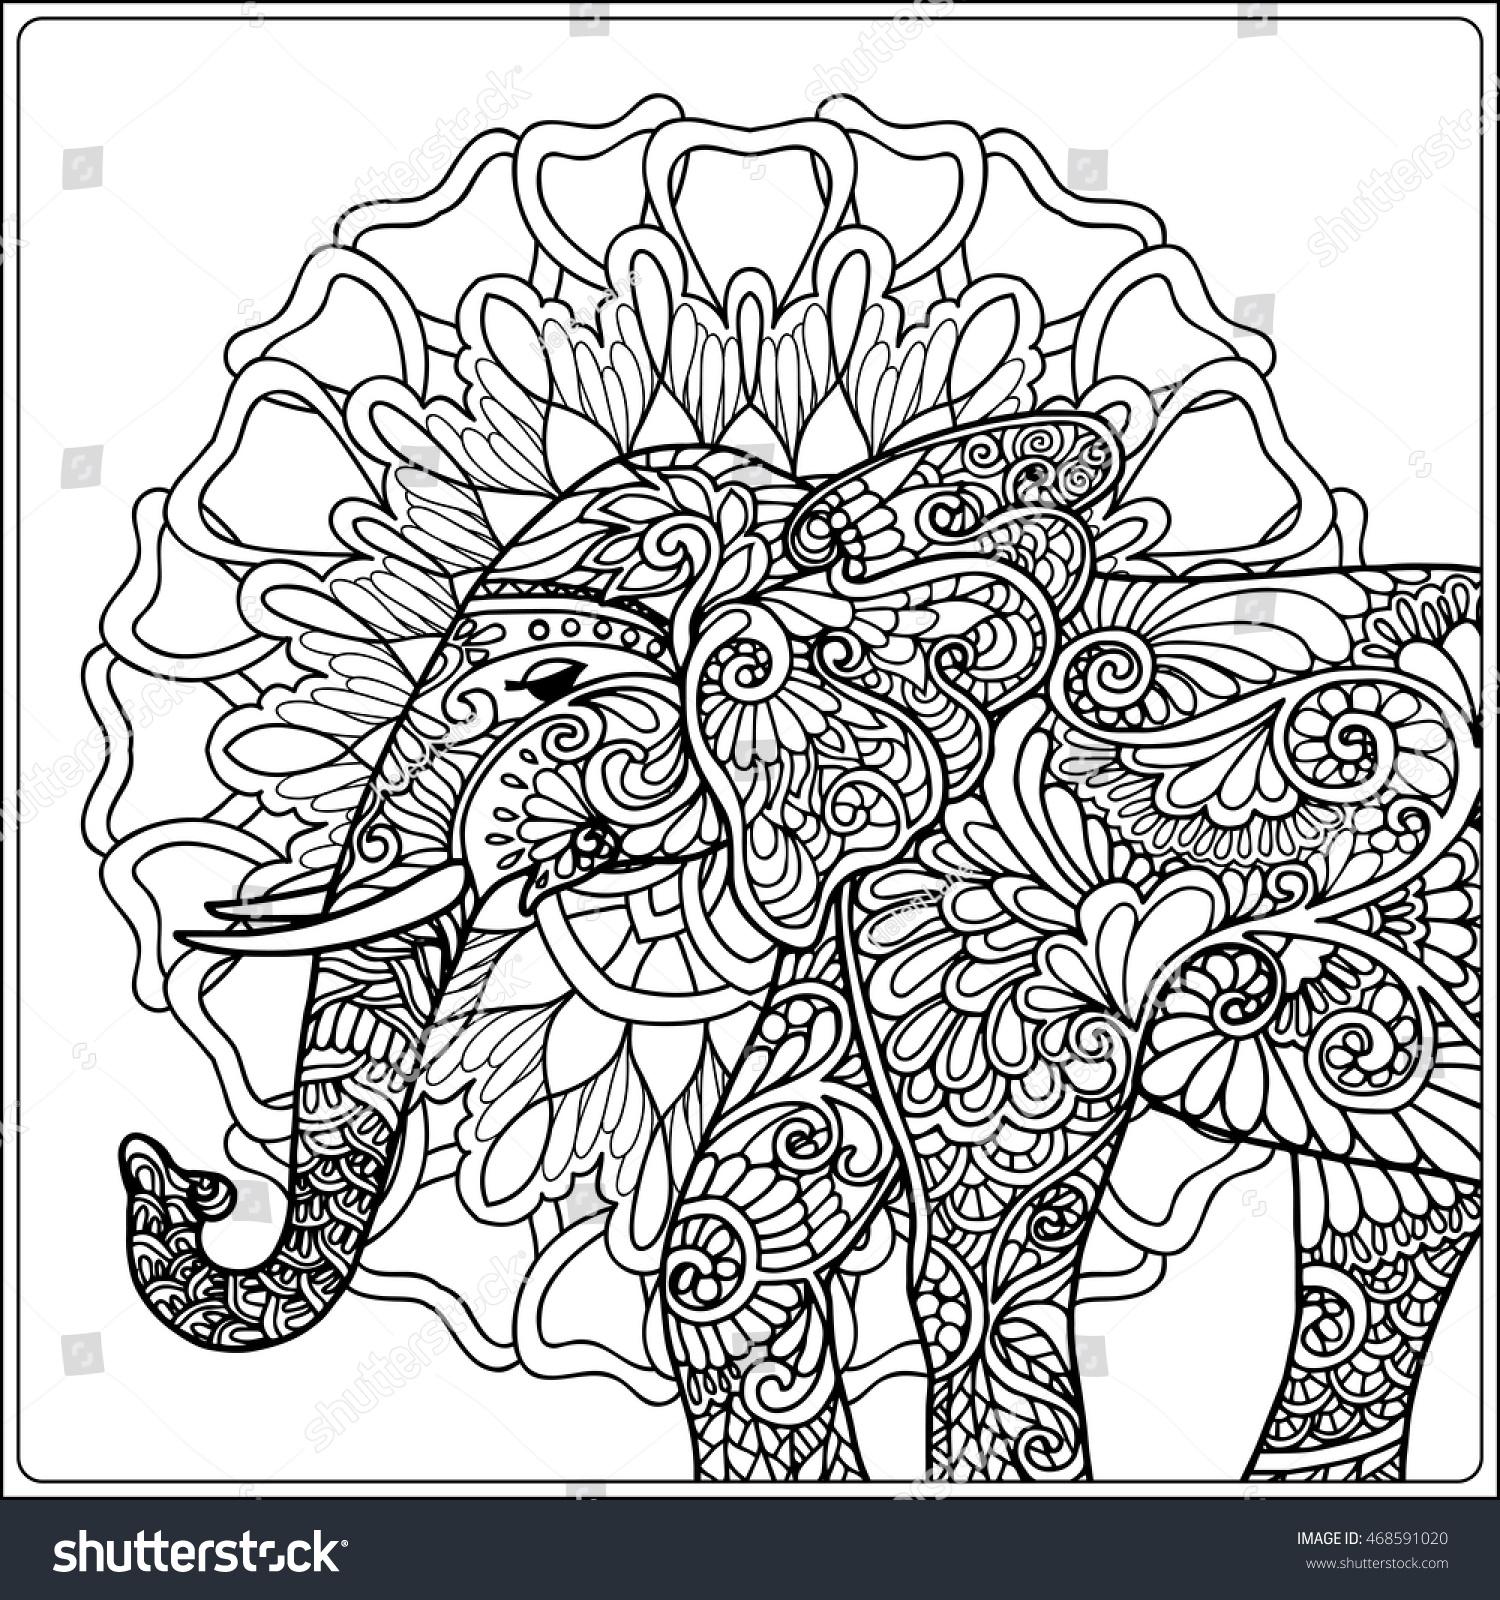 Coloring Page Elephant Decorative